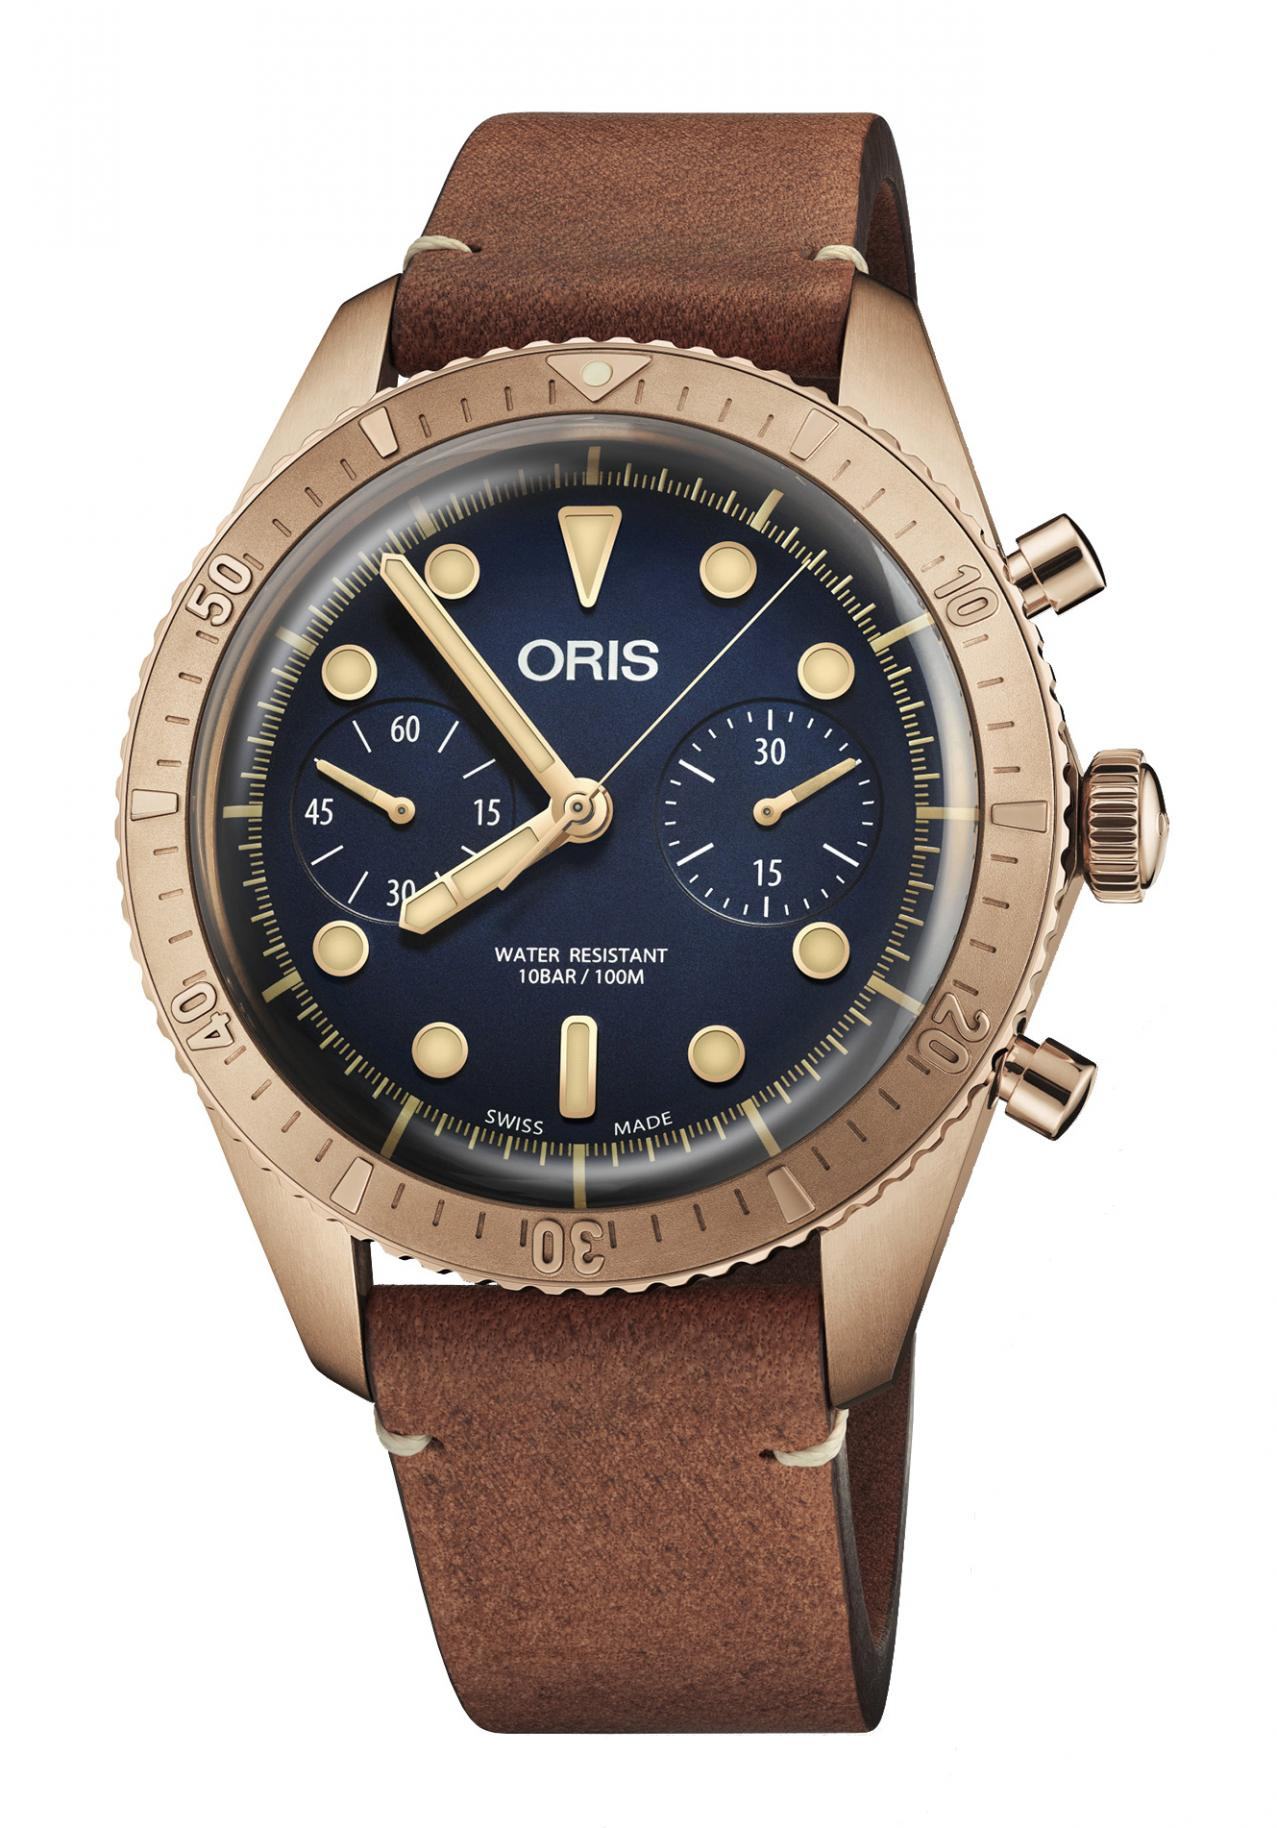 Oris Oris Carl Brashear Chronograph Limited Edition